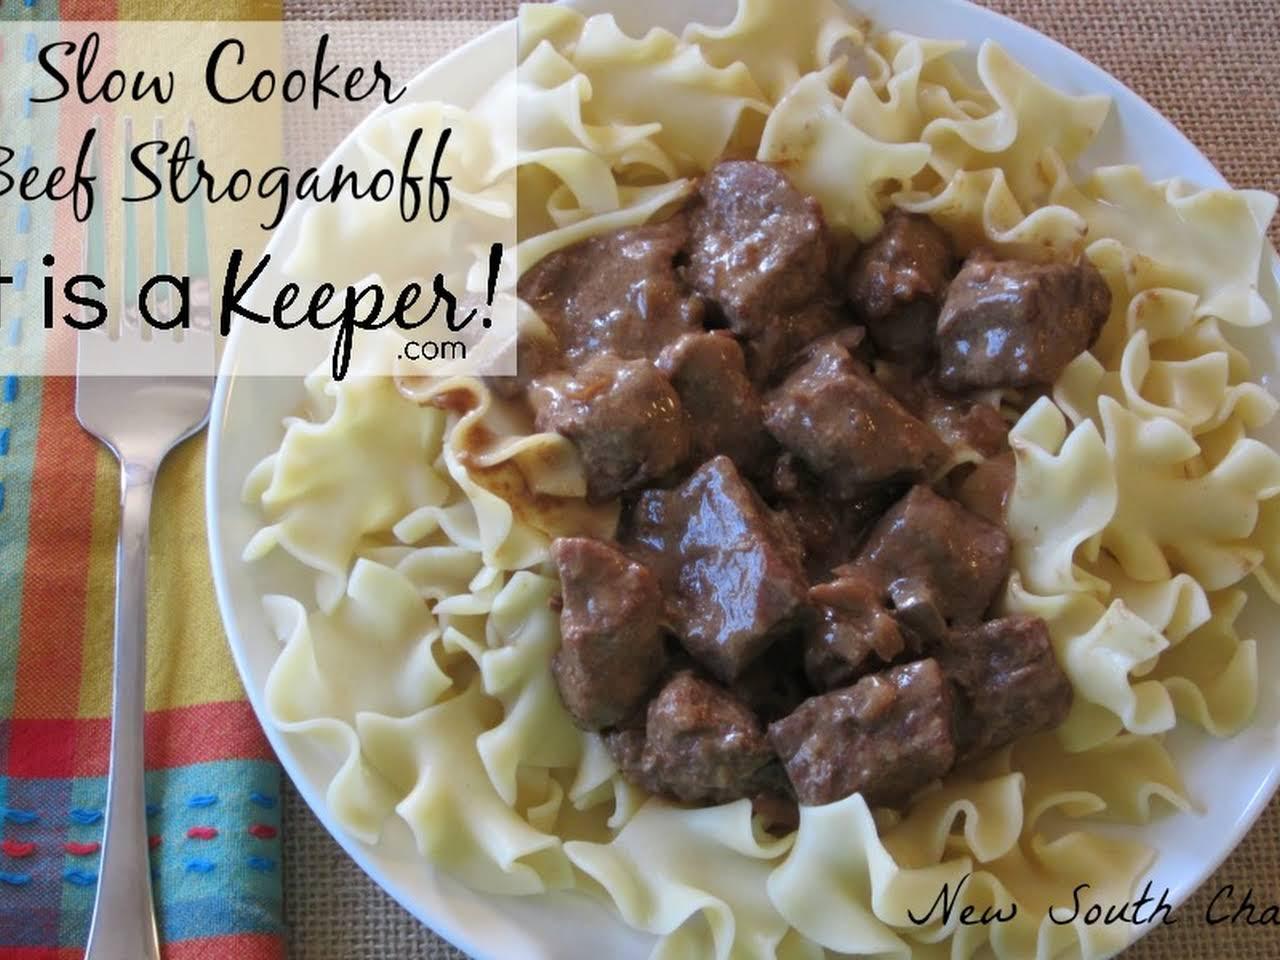 Ground Beef Stroganoff Recipe Without Cream Of Mushroom Soup